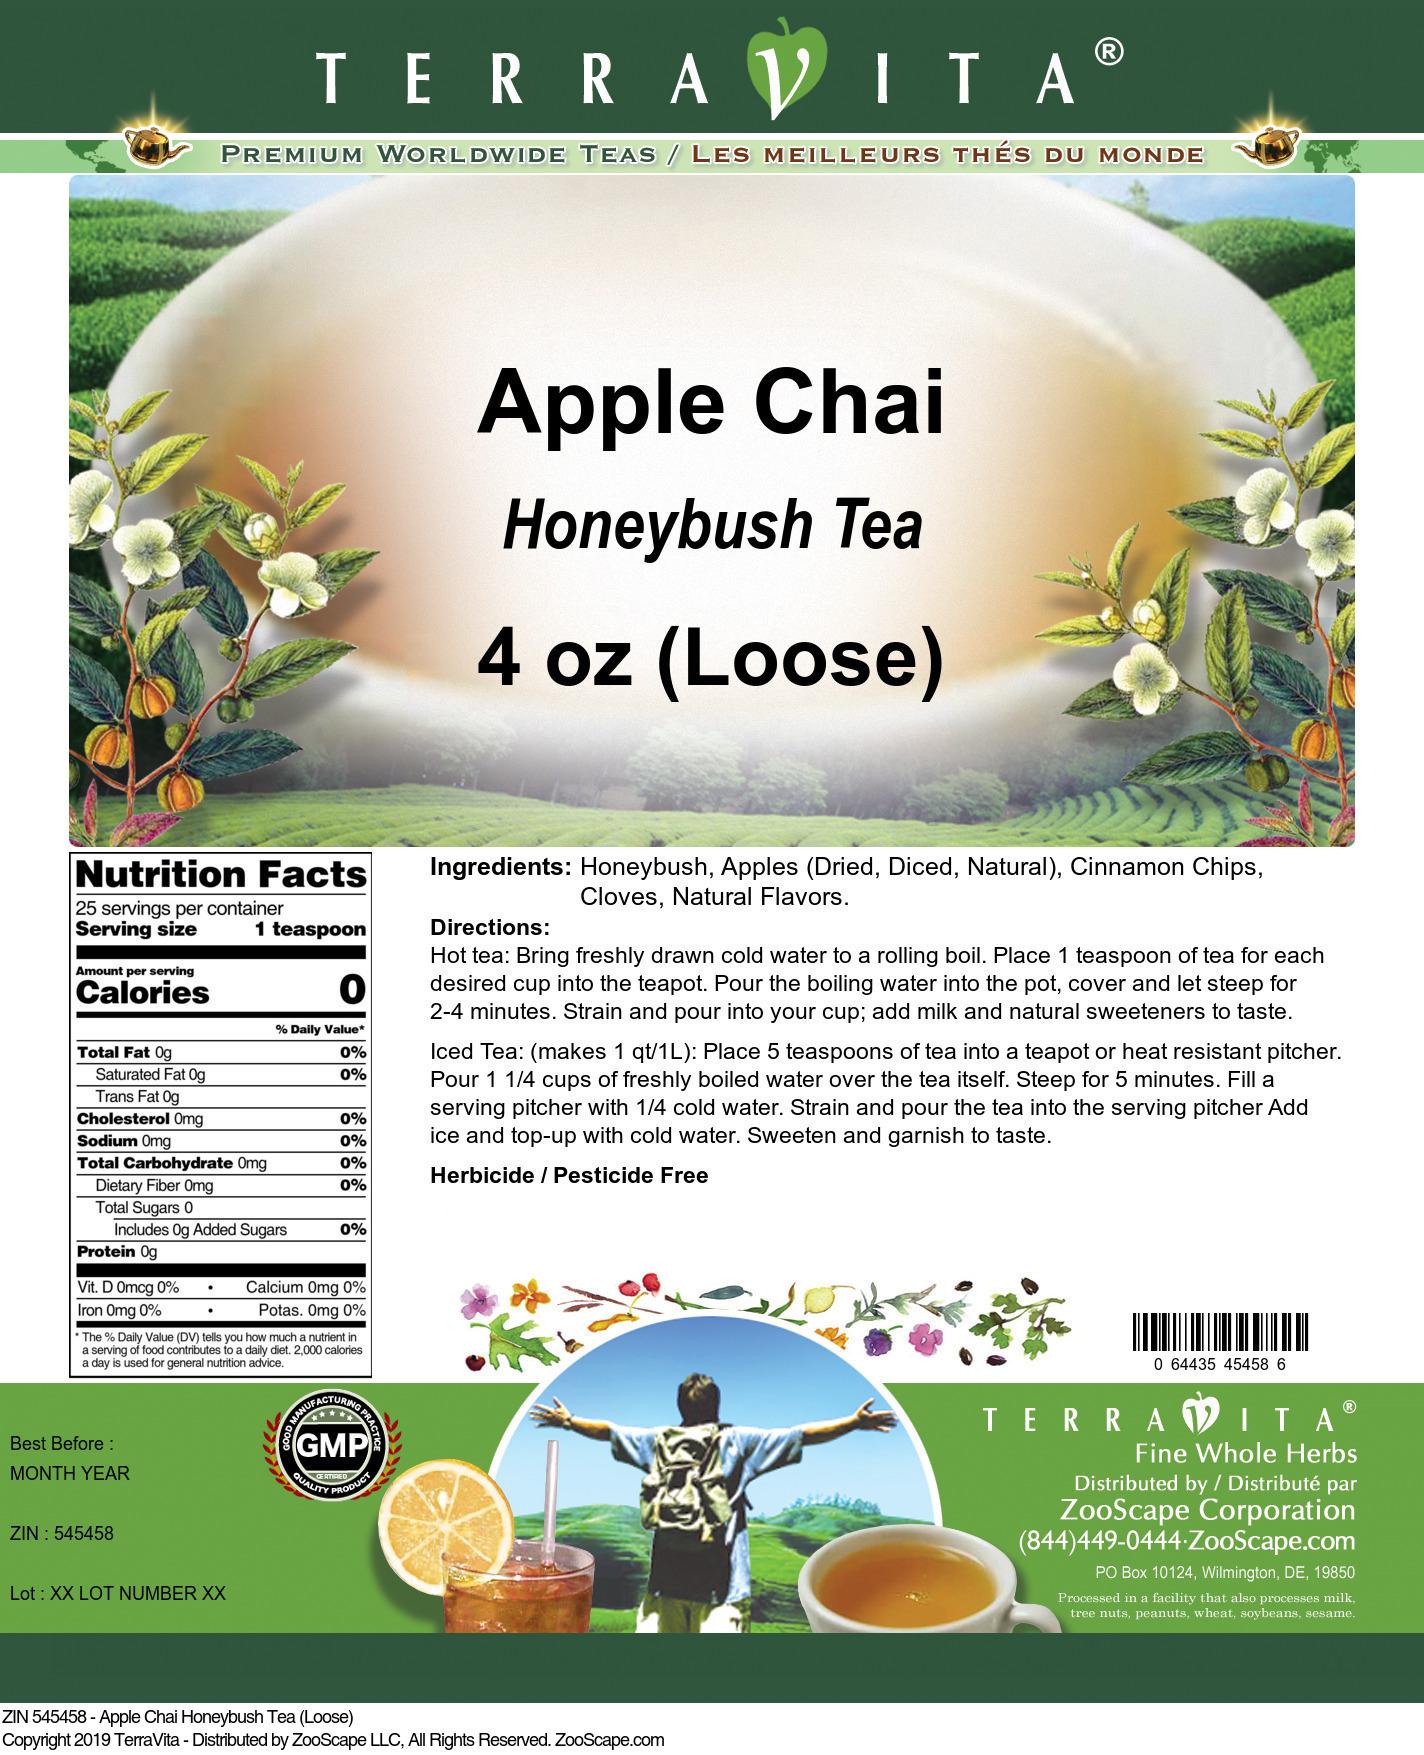 Apple Chai Honeybush Tea (Loose)